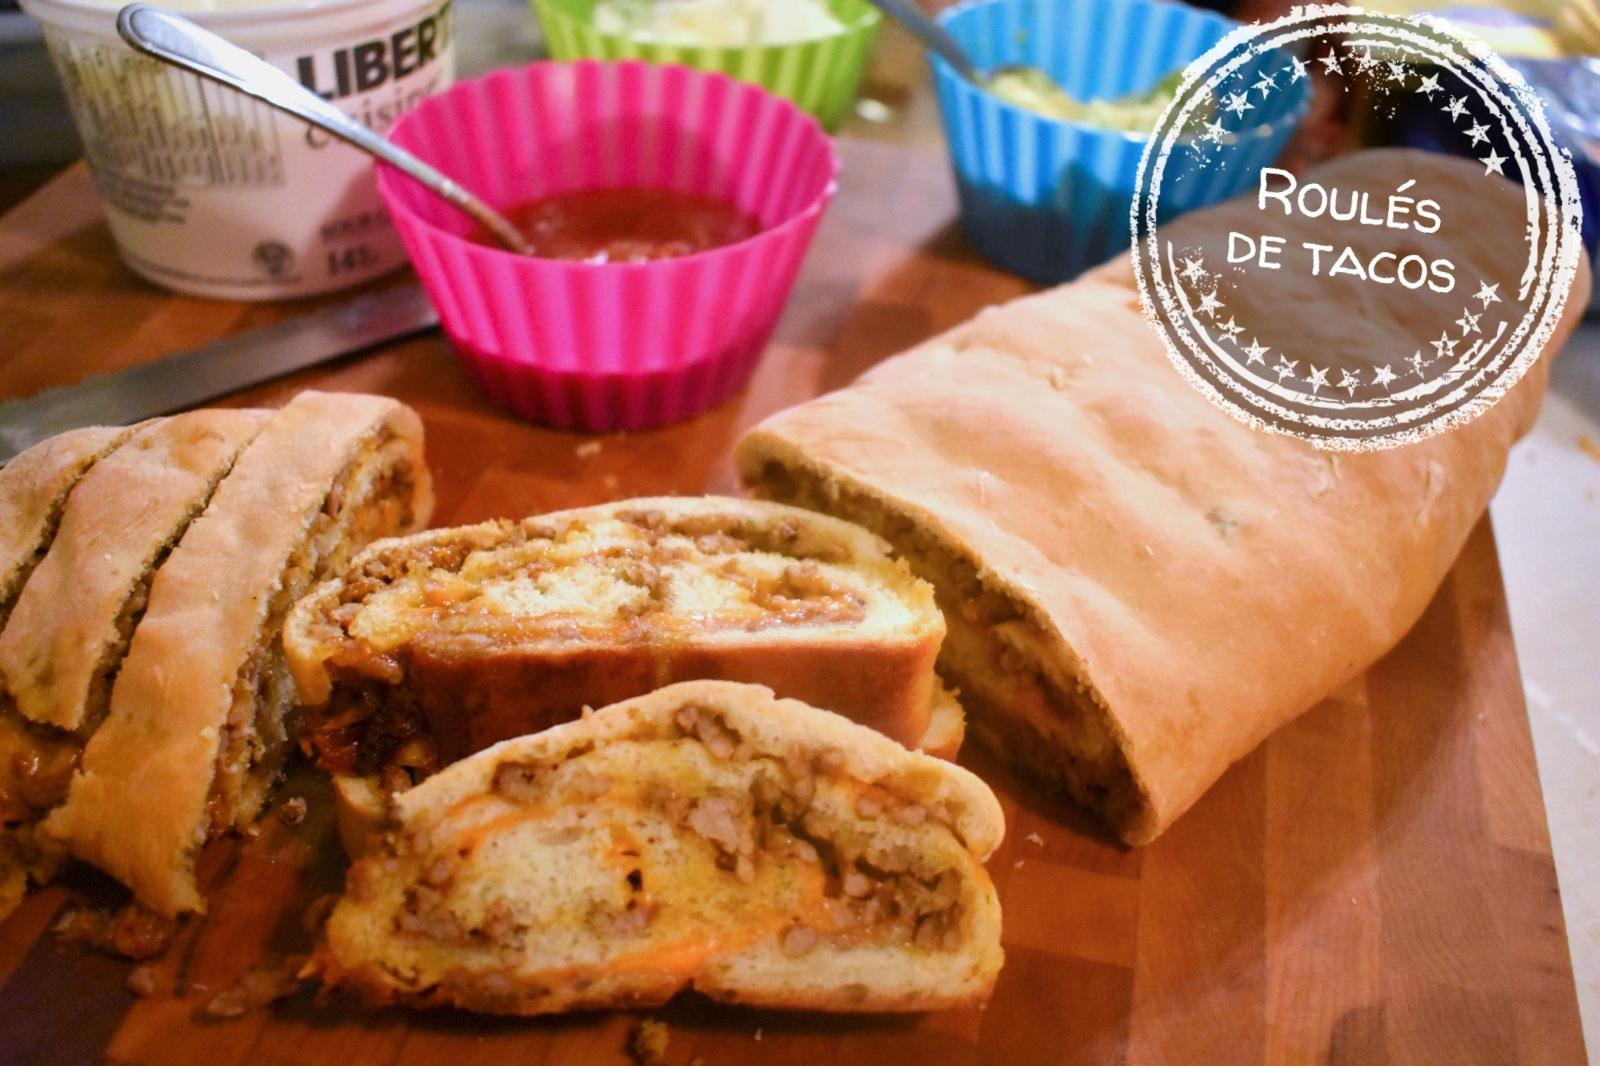 Roulés de tacos - Auboutdelalangue.com